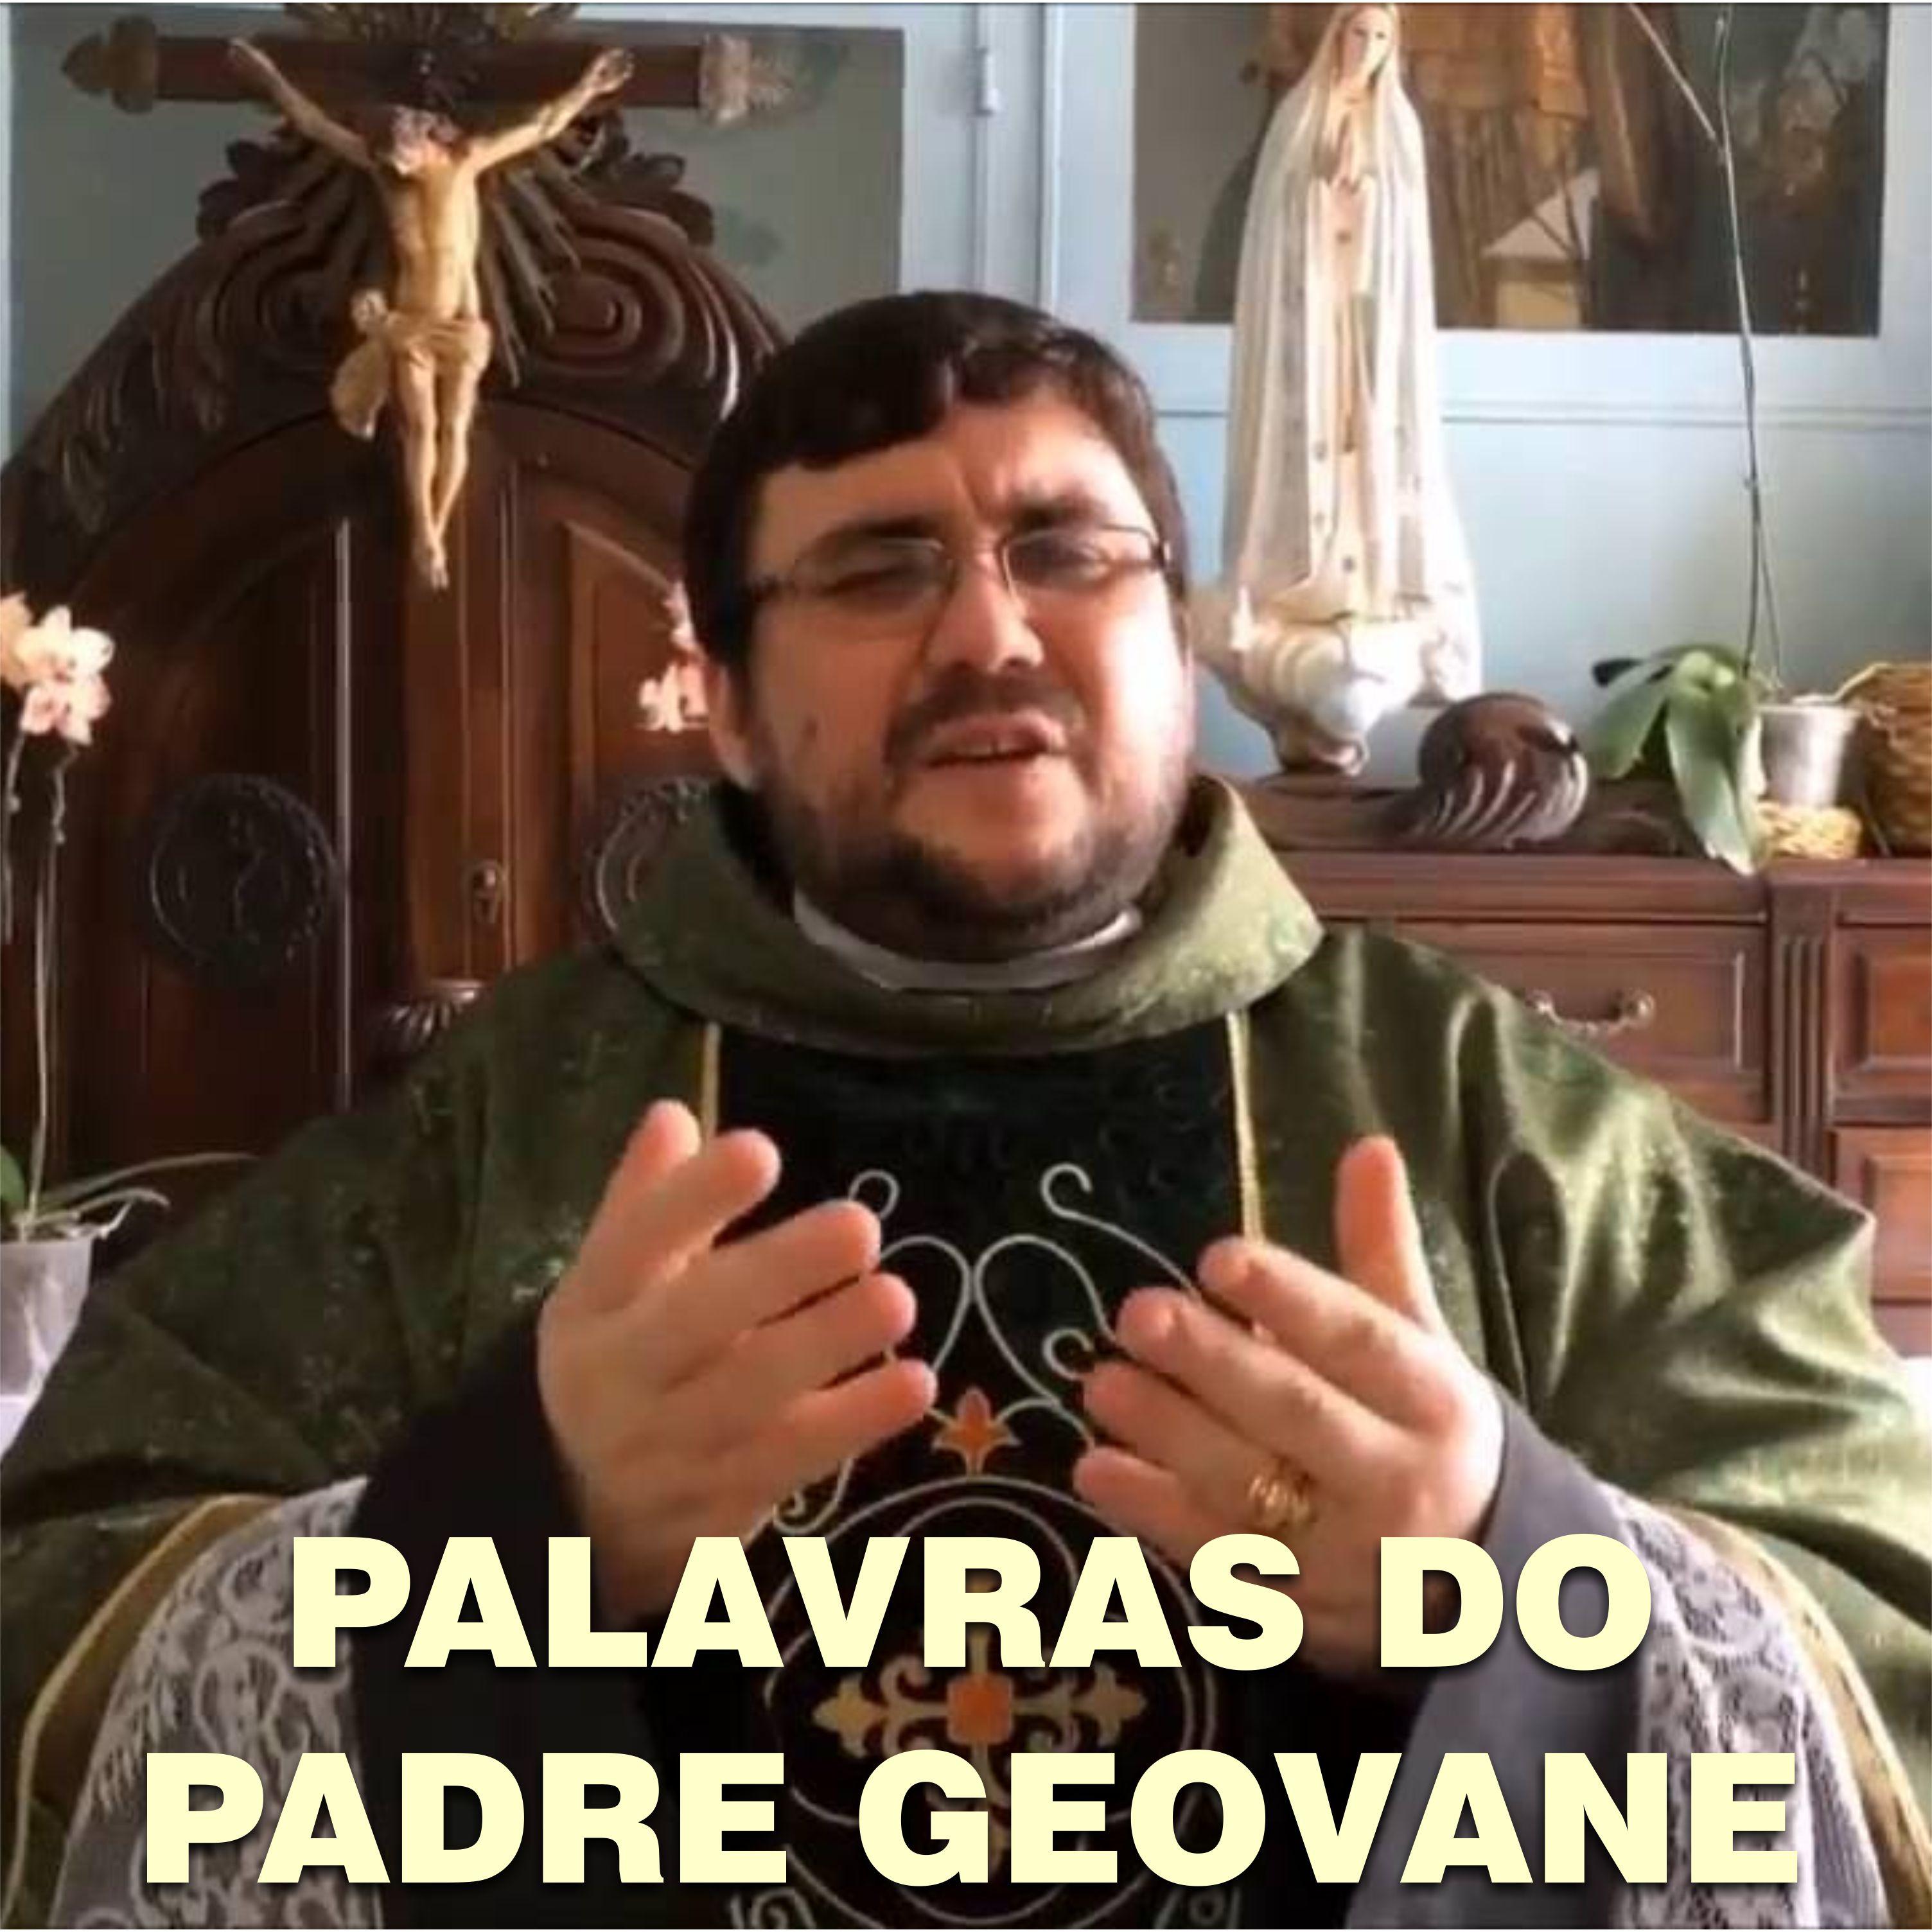 PALAVRAS DO PADRE GEOVANE